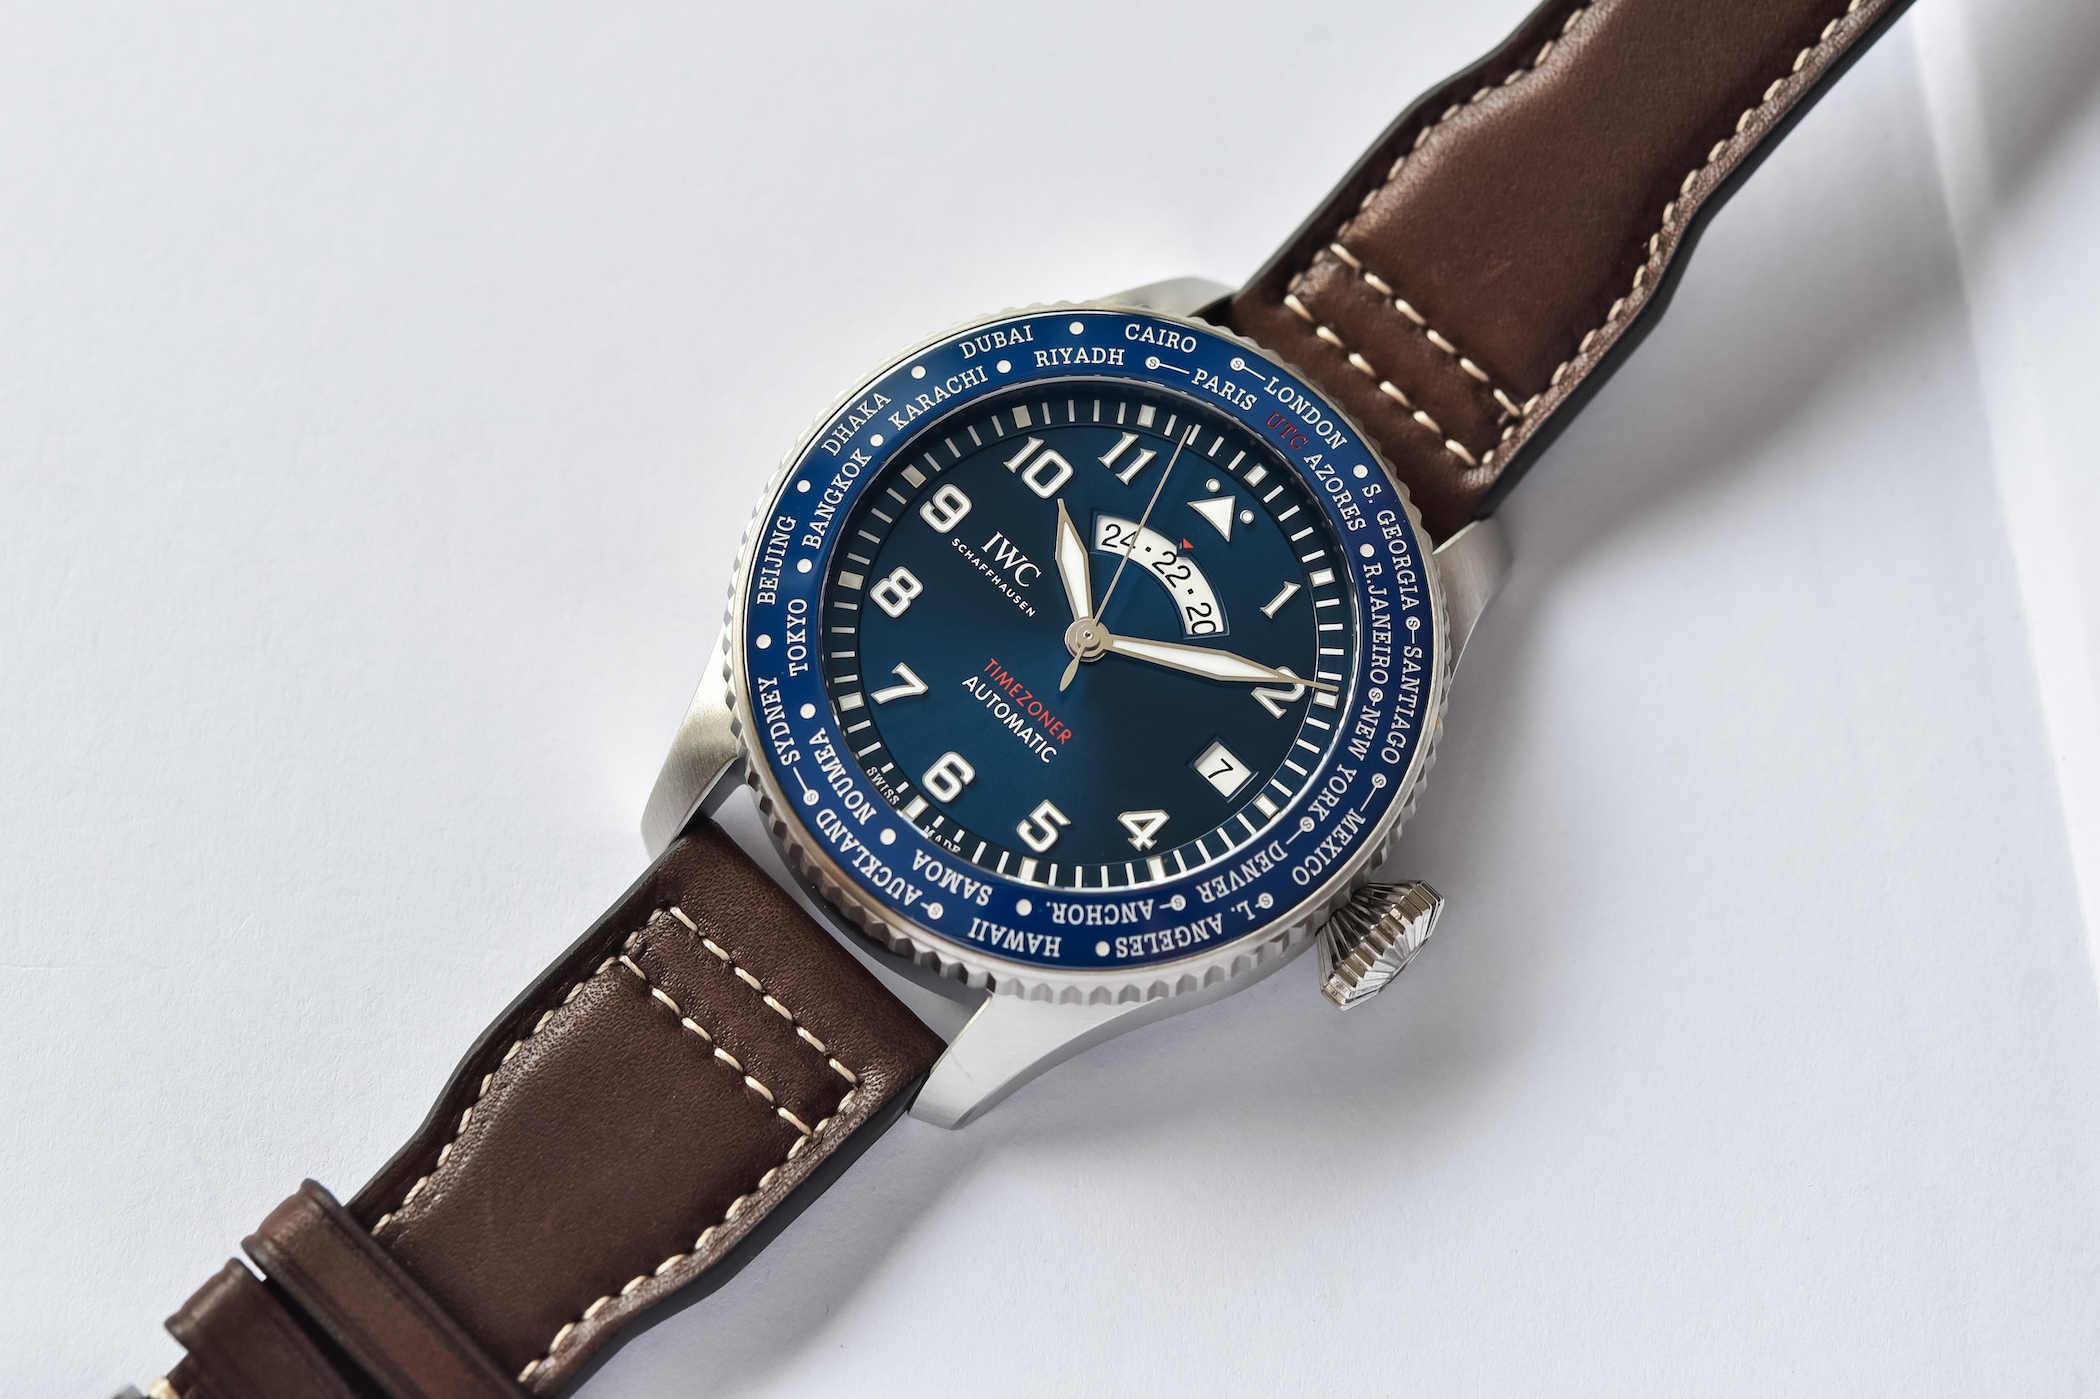 IWC Pilot's Watch Timezoner Edition Le Petit Prince IW395503